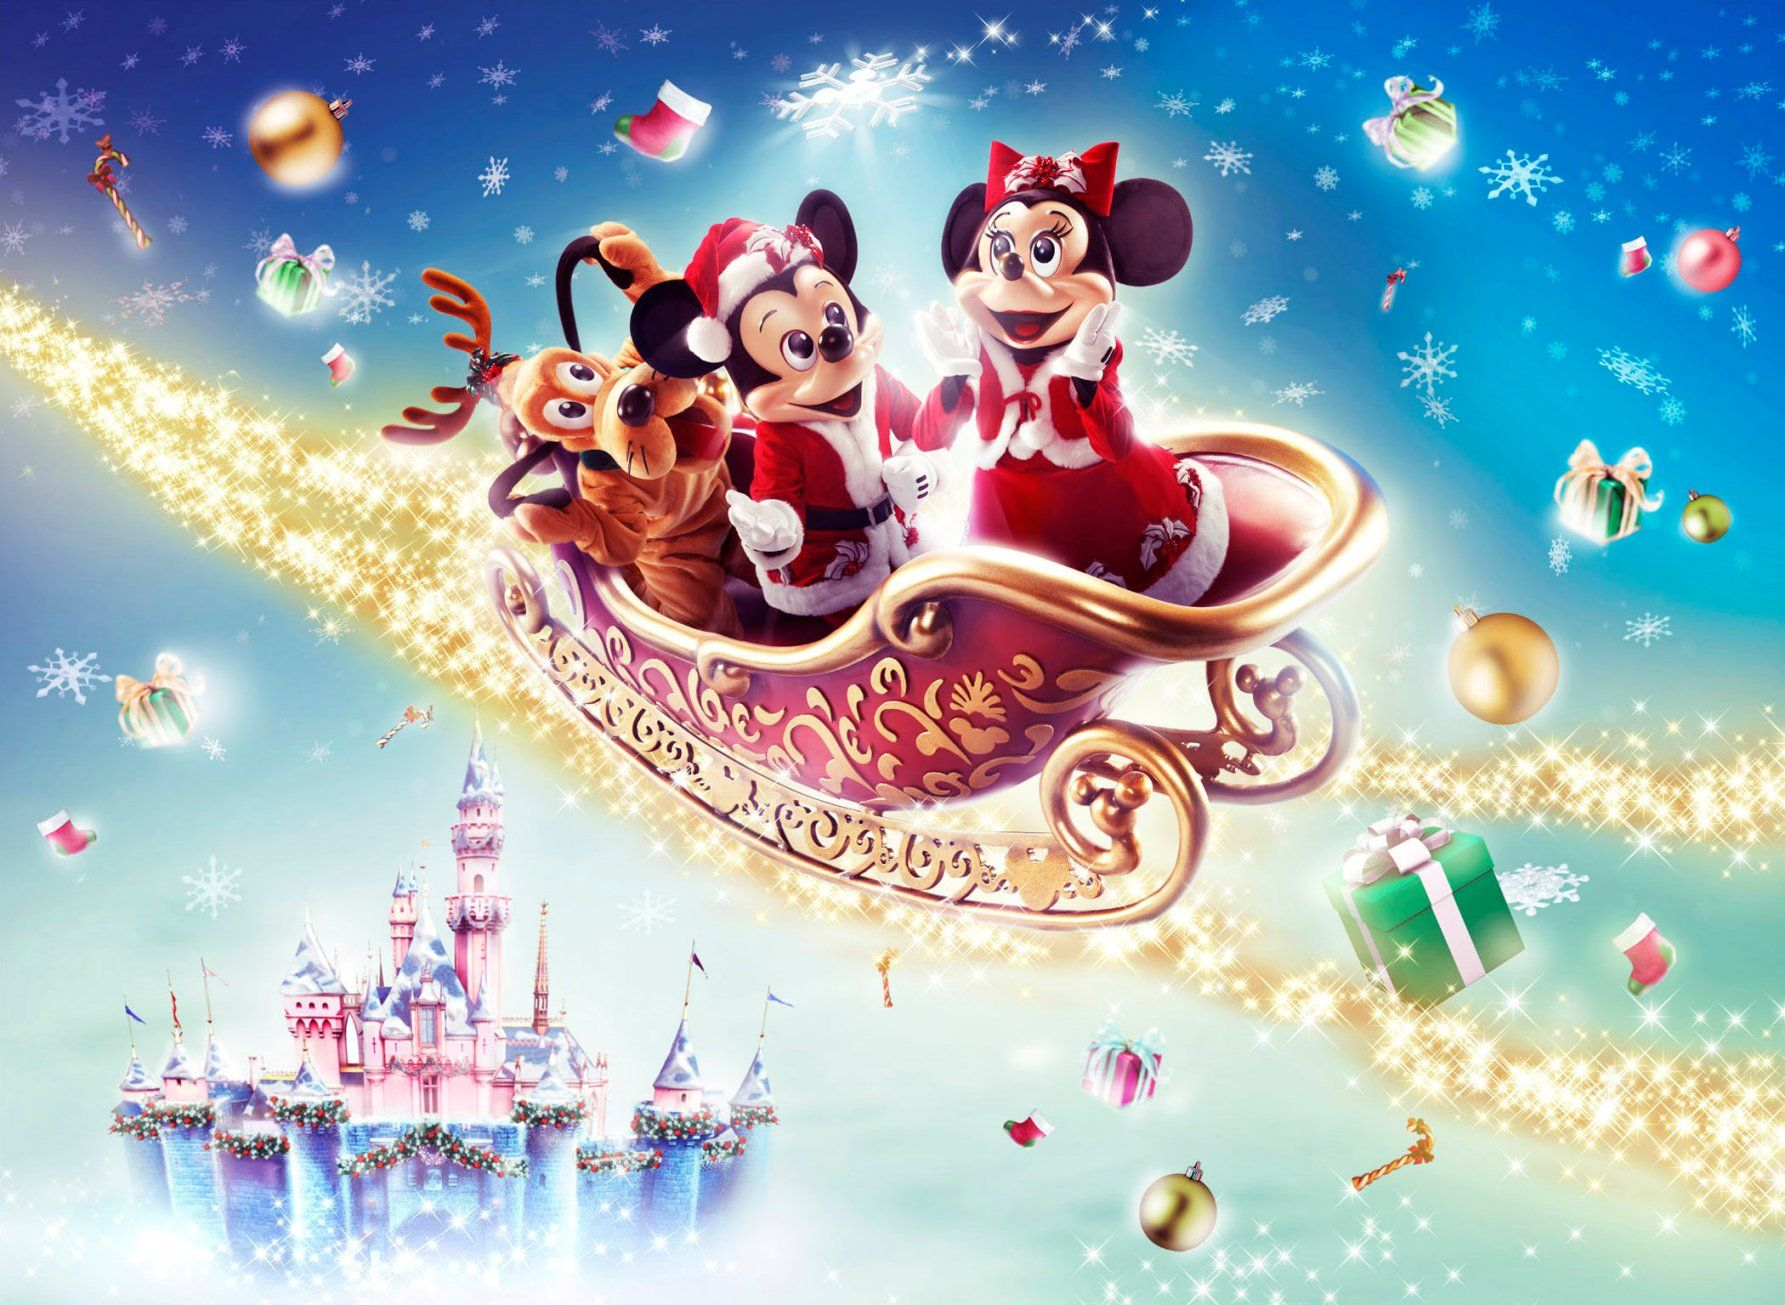 Sparkling Disney Christmas 2013 Wallpaper Chistmas